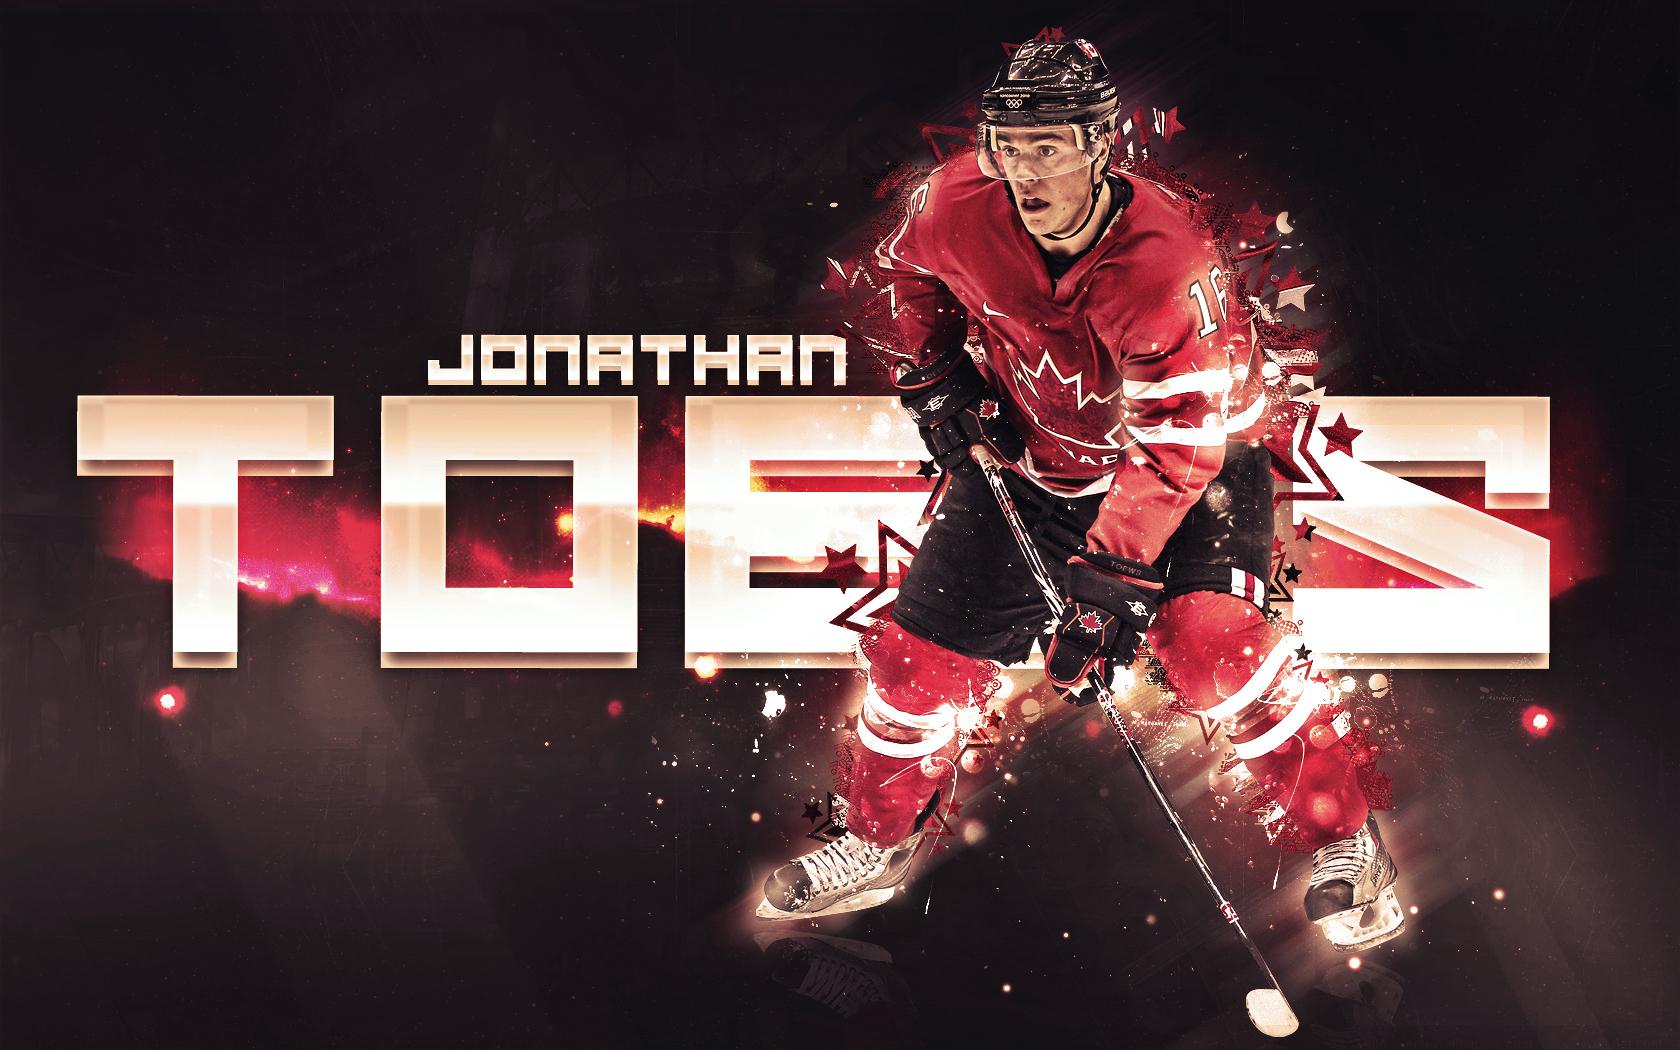 Jonathan Toews High Definition